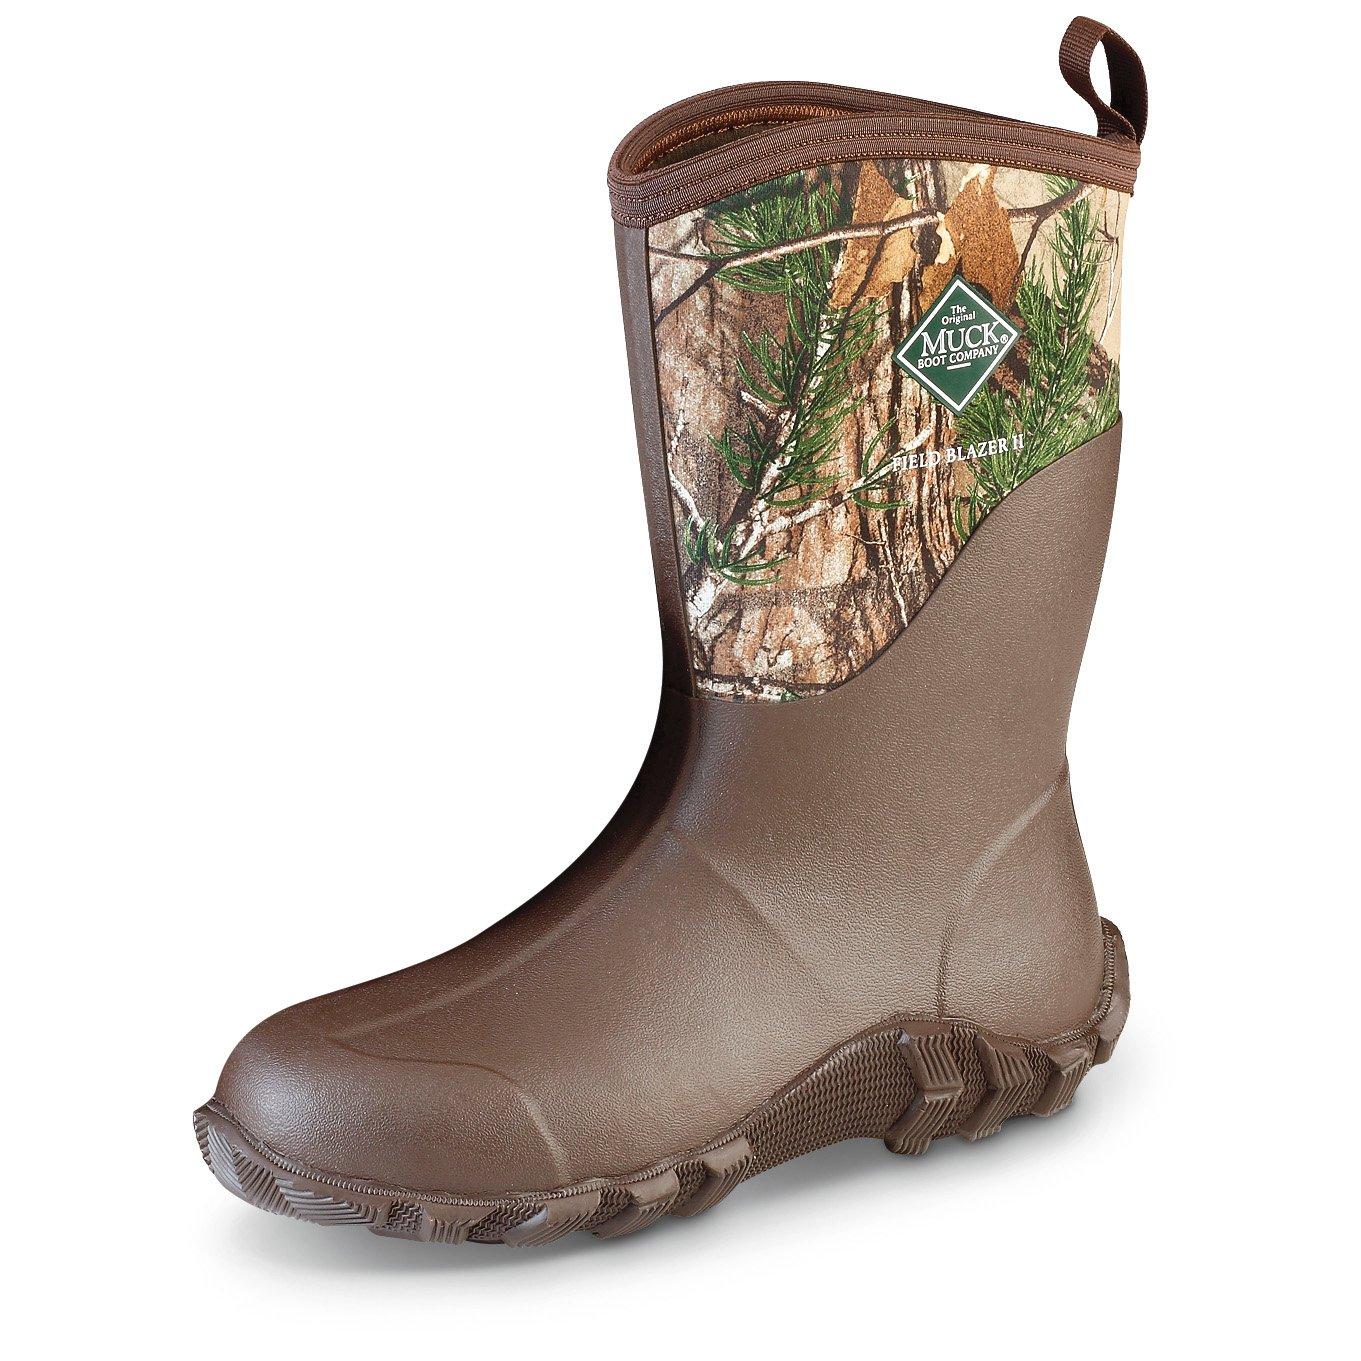 Muck Boot Men's Fieldblazer 2 Mid Calf Boot, Realtree Extra, 12 Regular US by Muck Boot